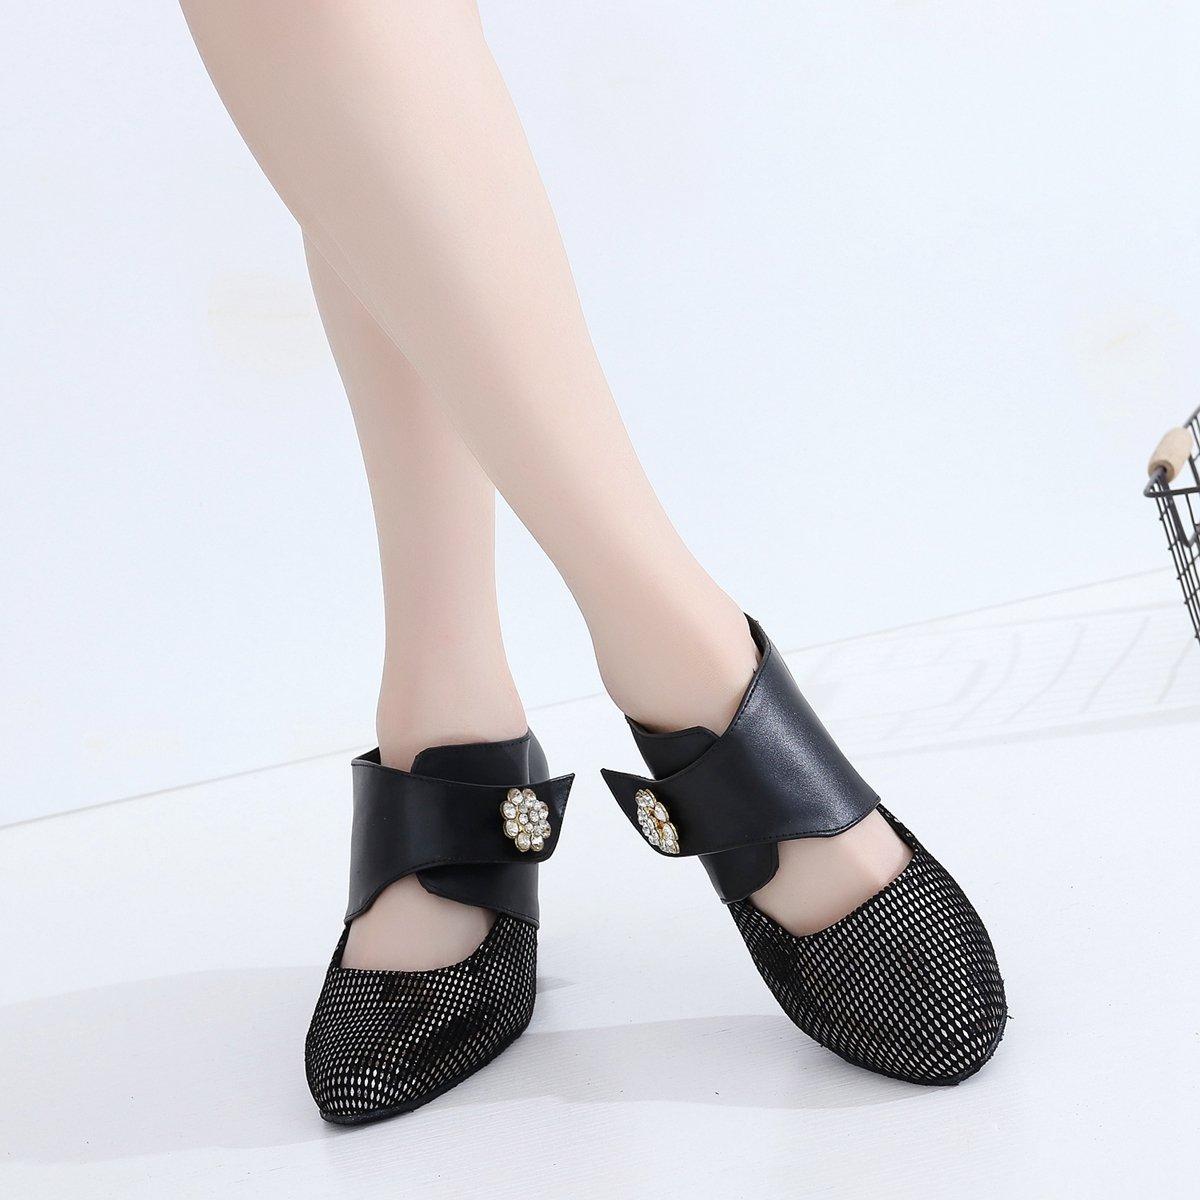 Minishion Women's Velcro Rhinestone Tango Leather Tango Rhinestone Latin Dance Shoes Evening Formal Party Pumps B07252C5MY Dance b0a618